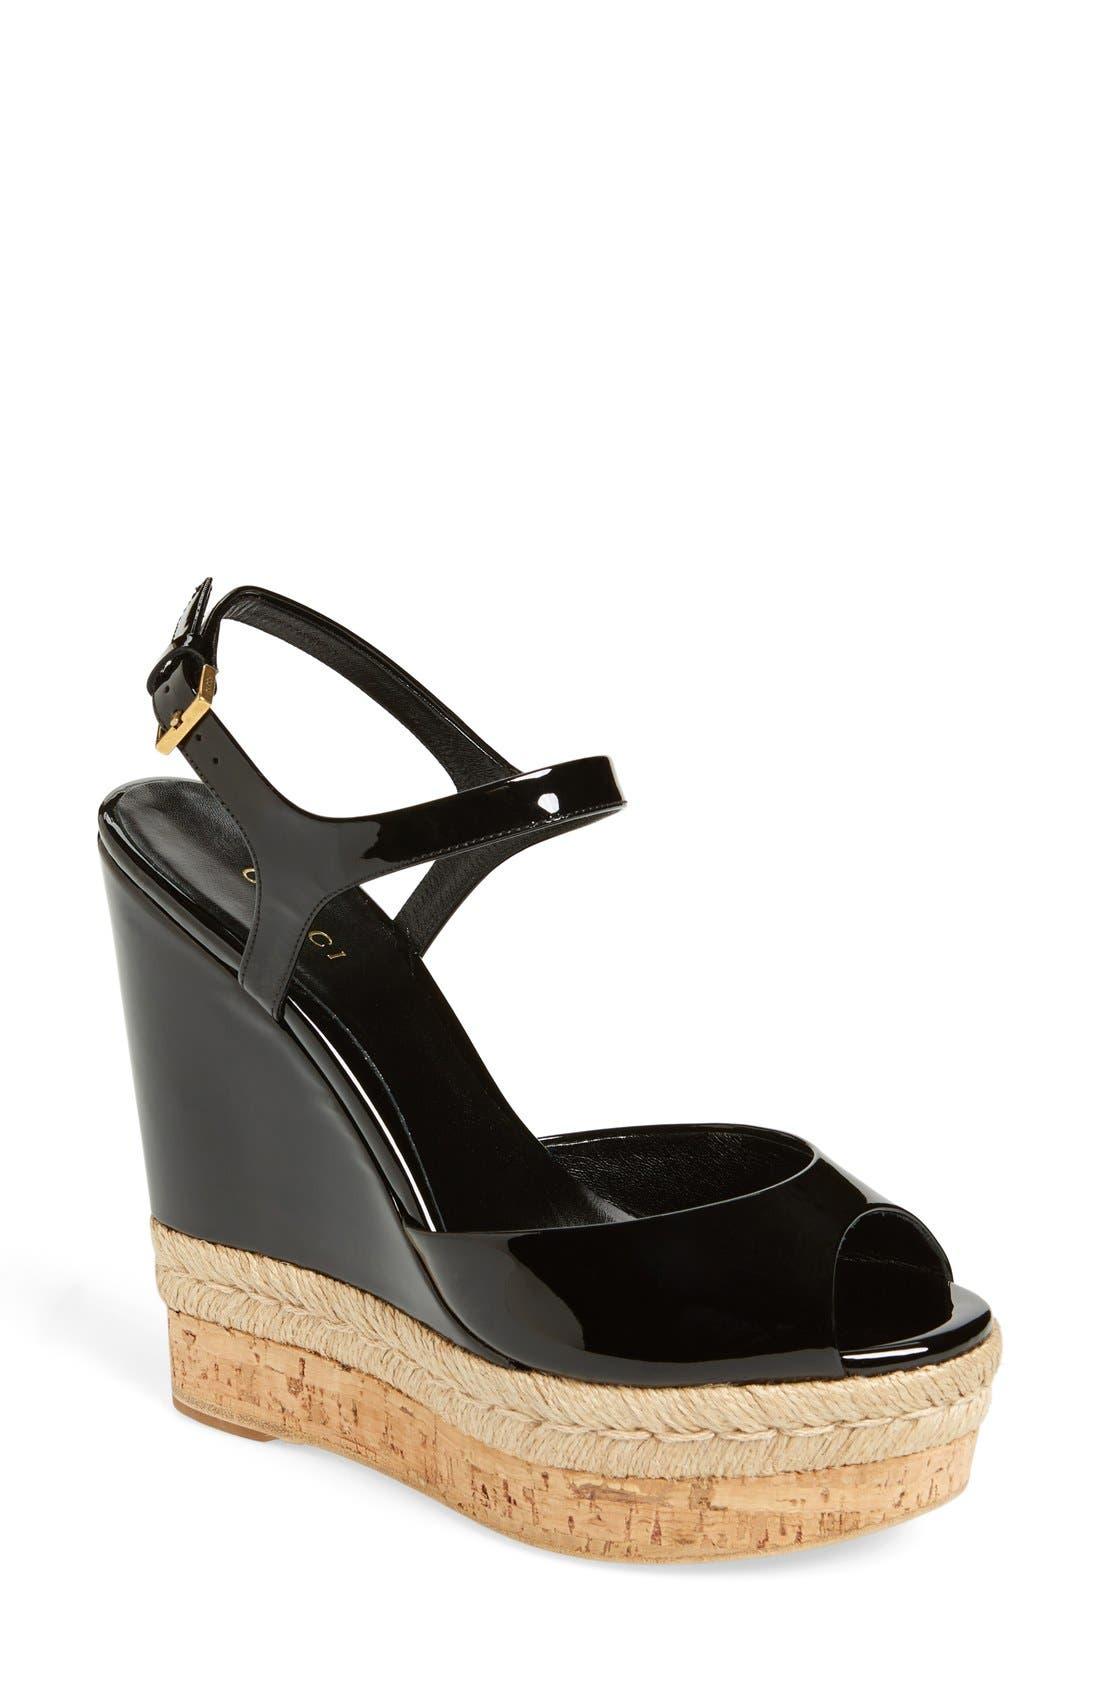 Main Image - Gucci 'Hollie' Wedge Sandal